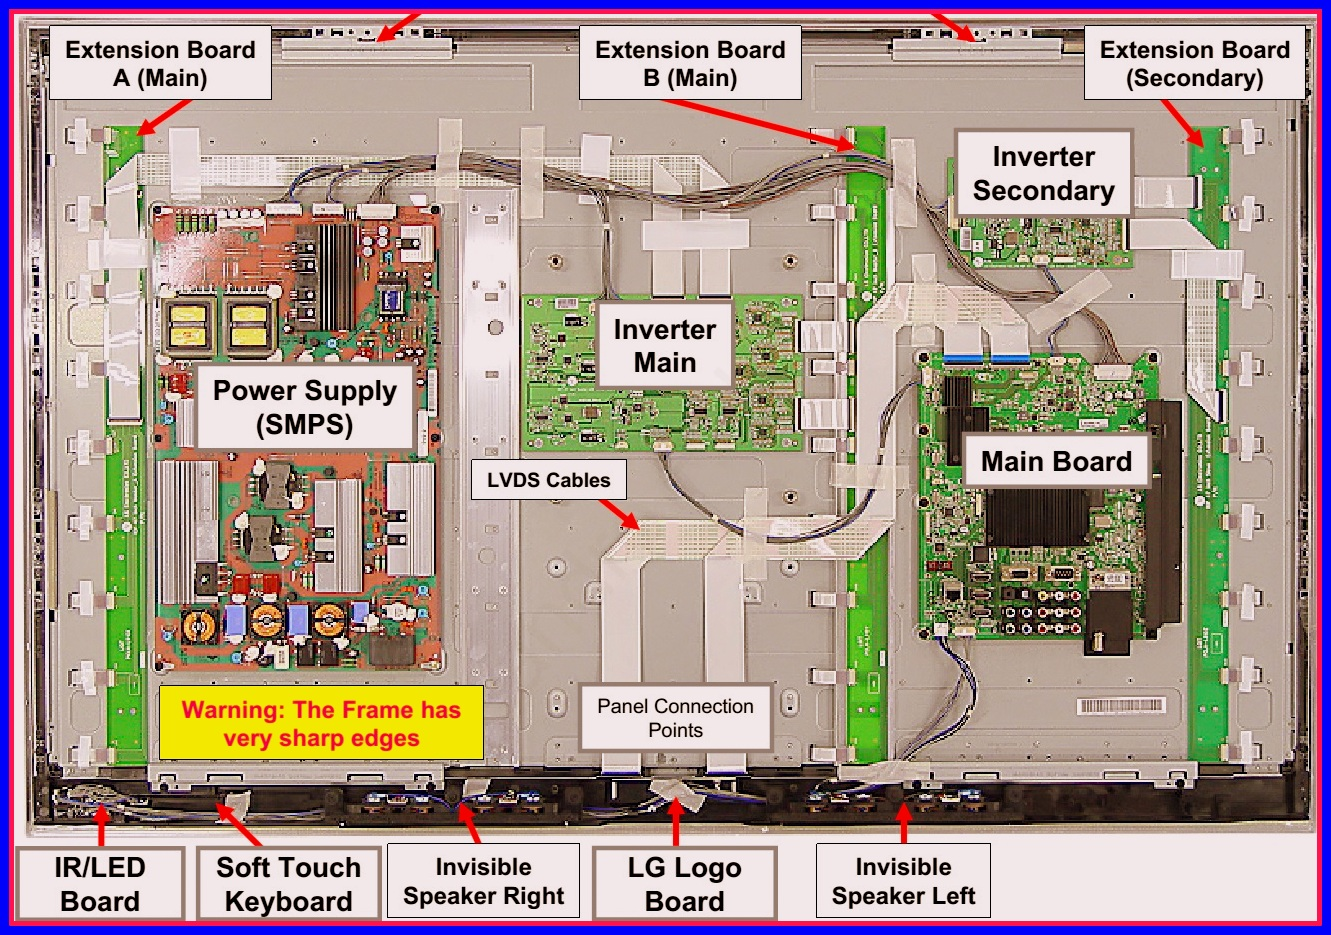 Camera Wiring Diagram Electronic Repair Guide With Wiring Diagram